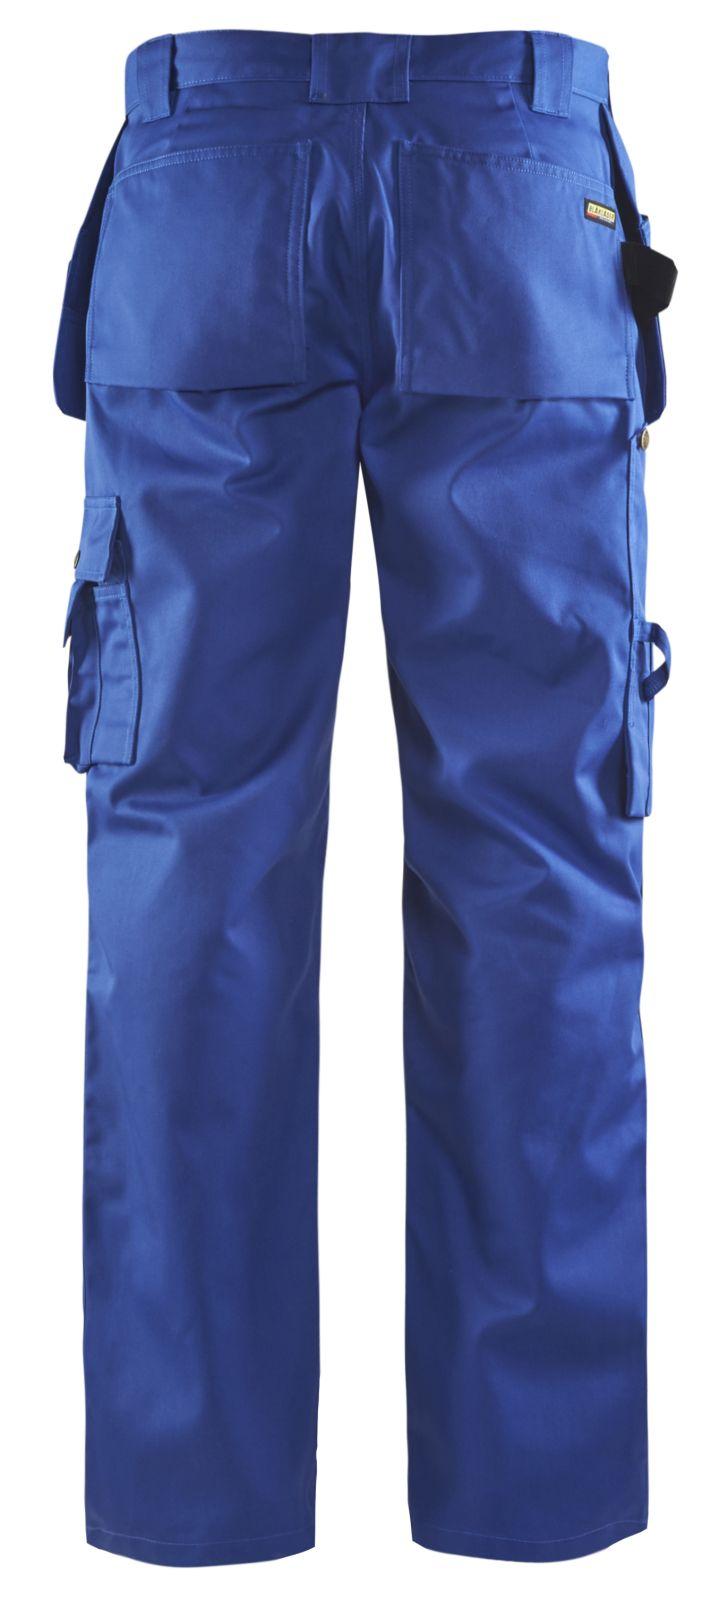 Blaklader Ambacht Werkbroeken- kniezakken- spijkerzakken 15301860 Polyester- katoen- Cordura kobaltblauw(8500)